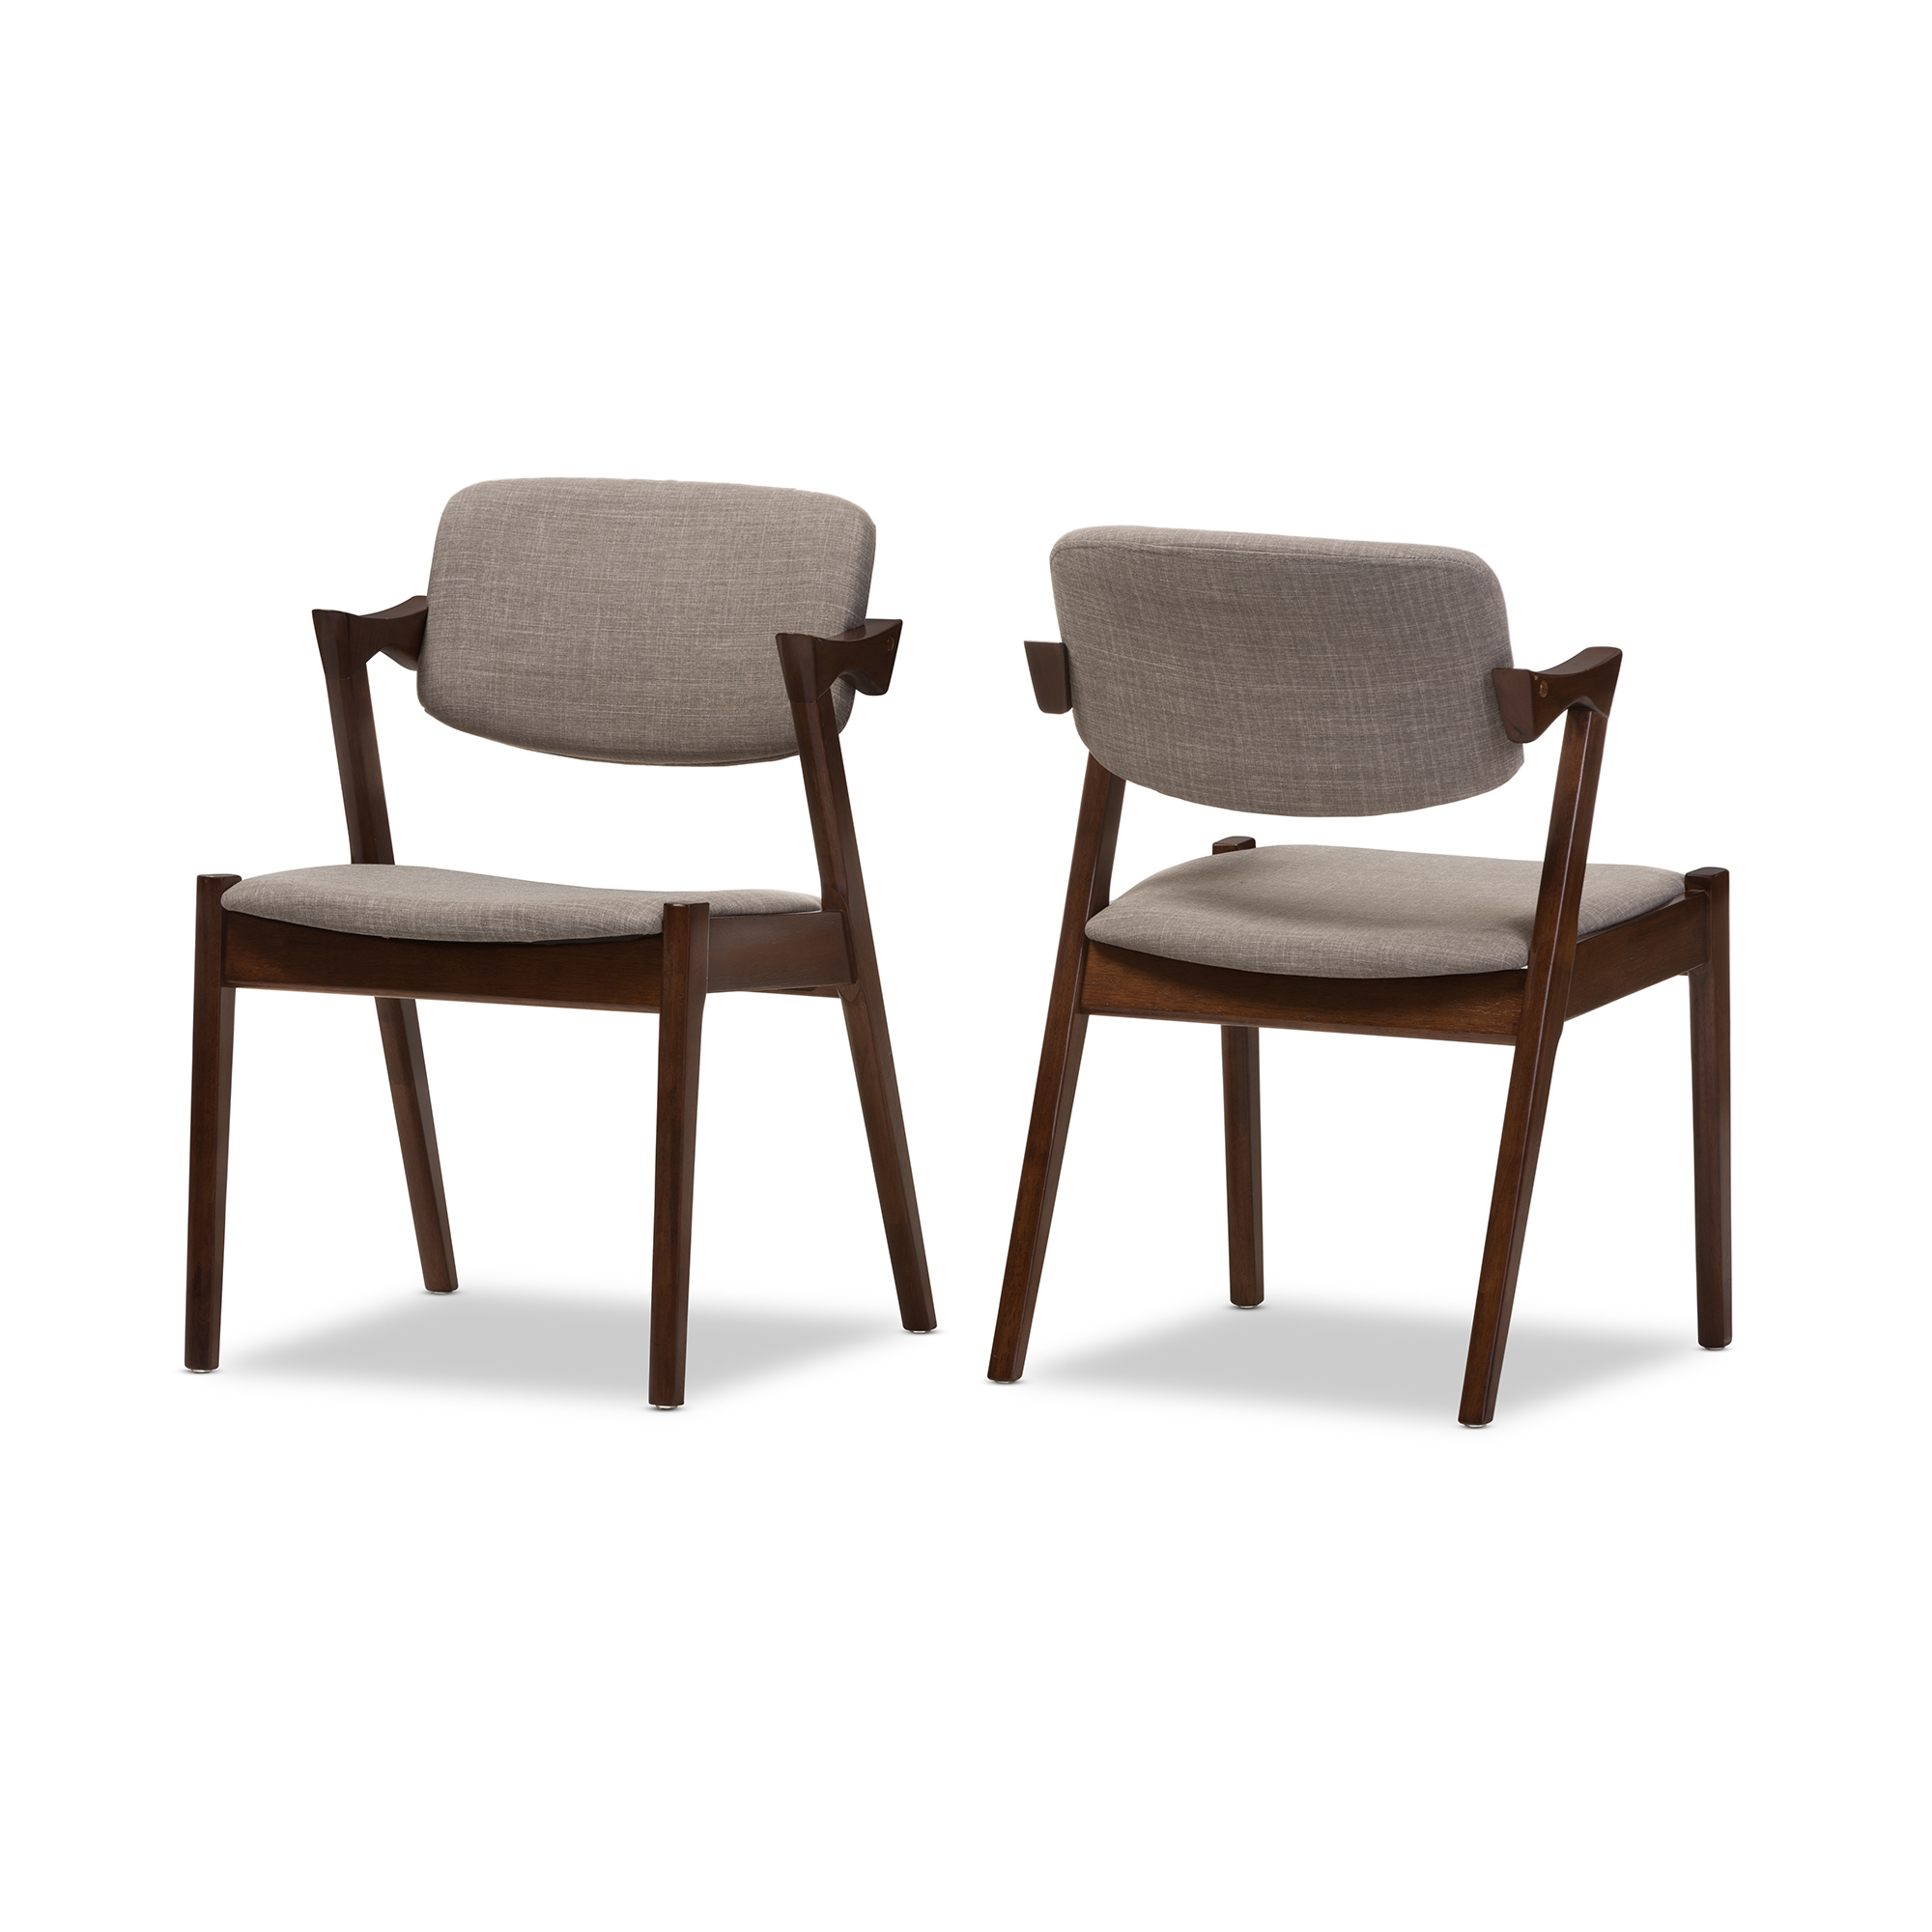 b8033d78947 Baxton Studio Elegant Mid-Century Dark Walnut Wood Grey Fabric Upholstered  Dining Armchair (Set of 2)